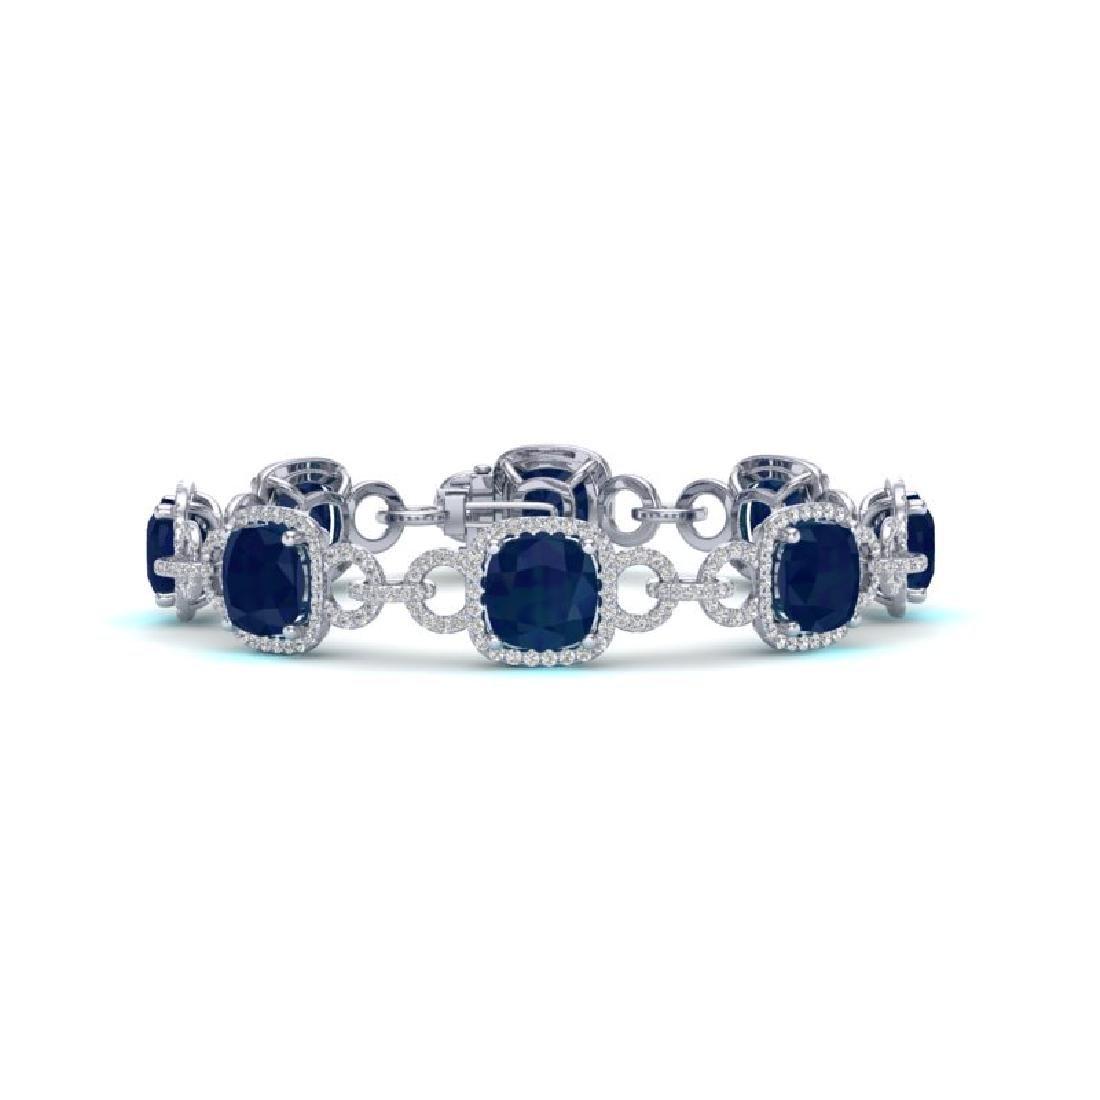 25 CTW Sapphire & VS/SI Diamond Bracelet 14K White Gold